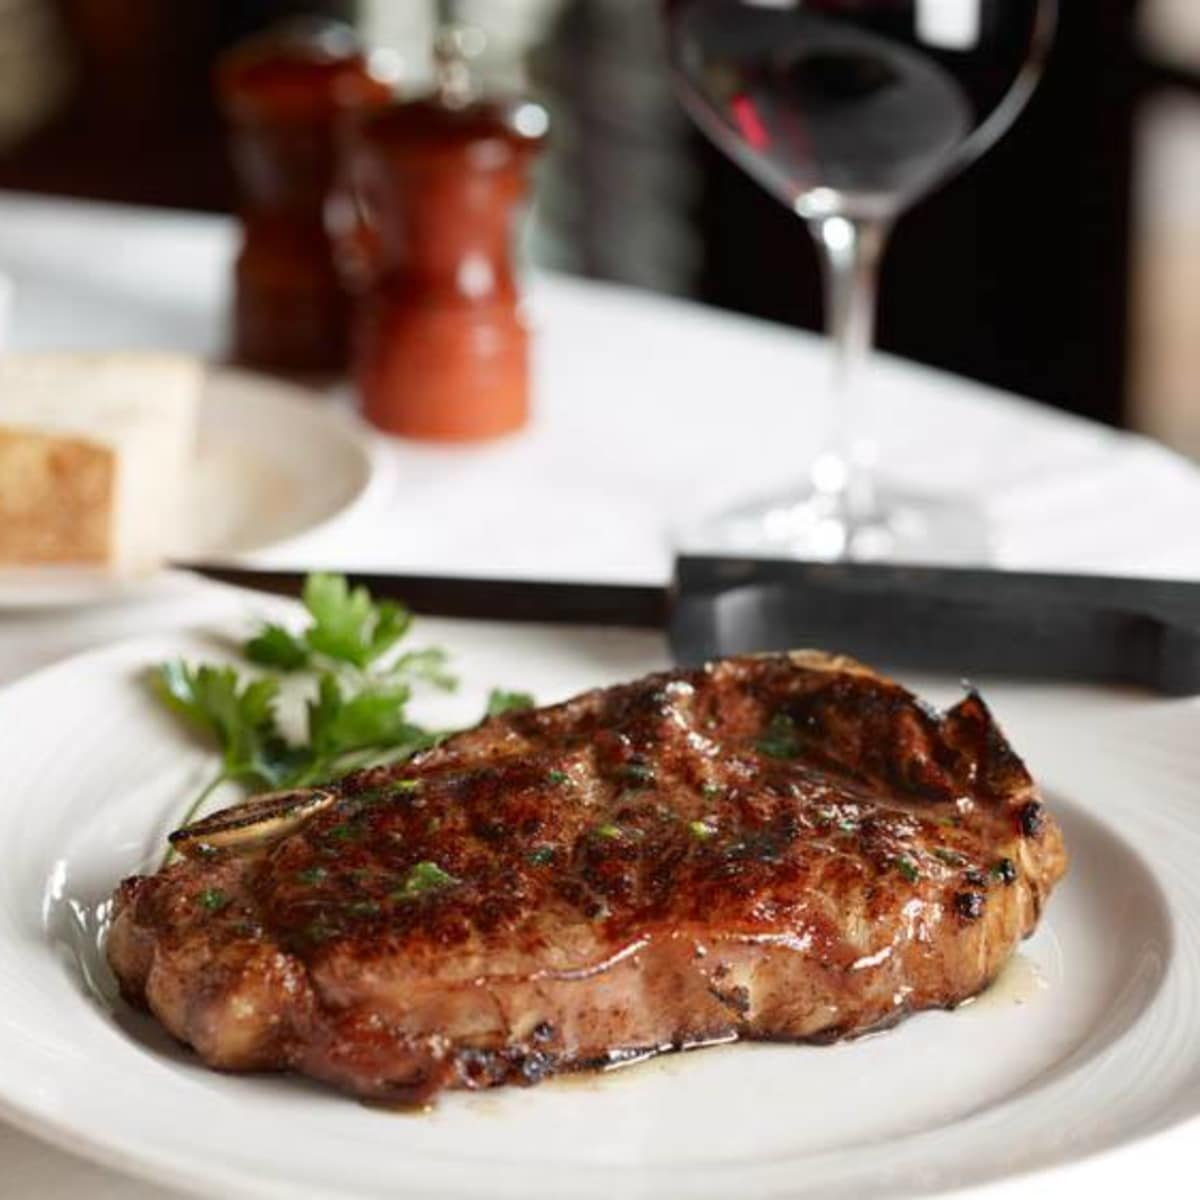 The Palm steak